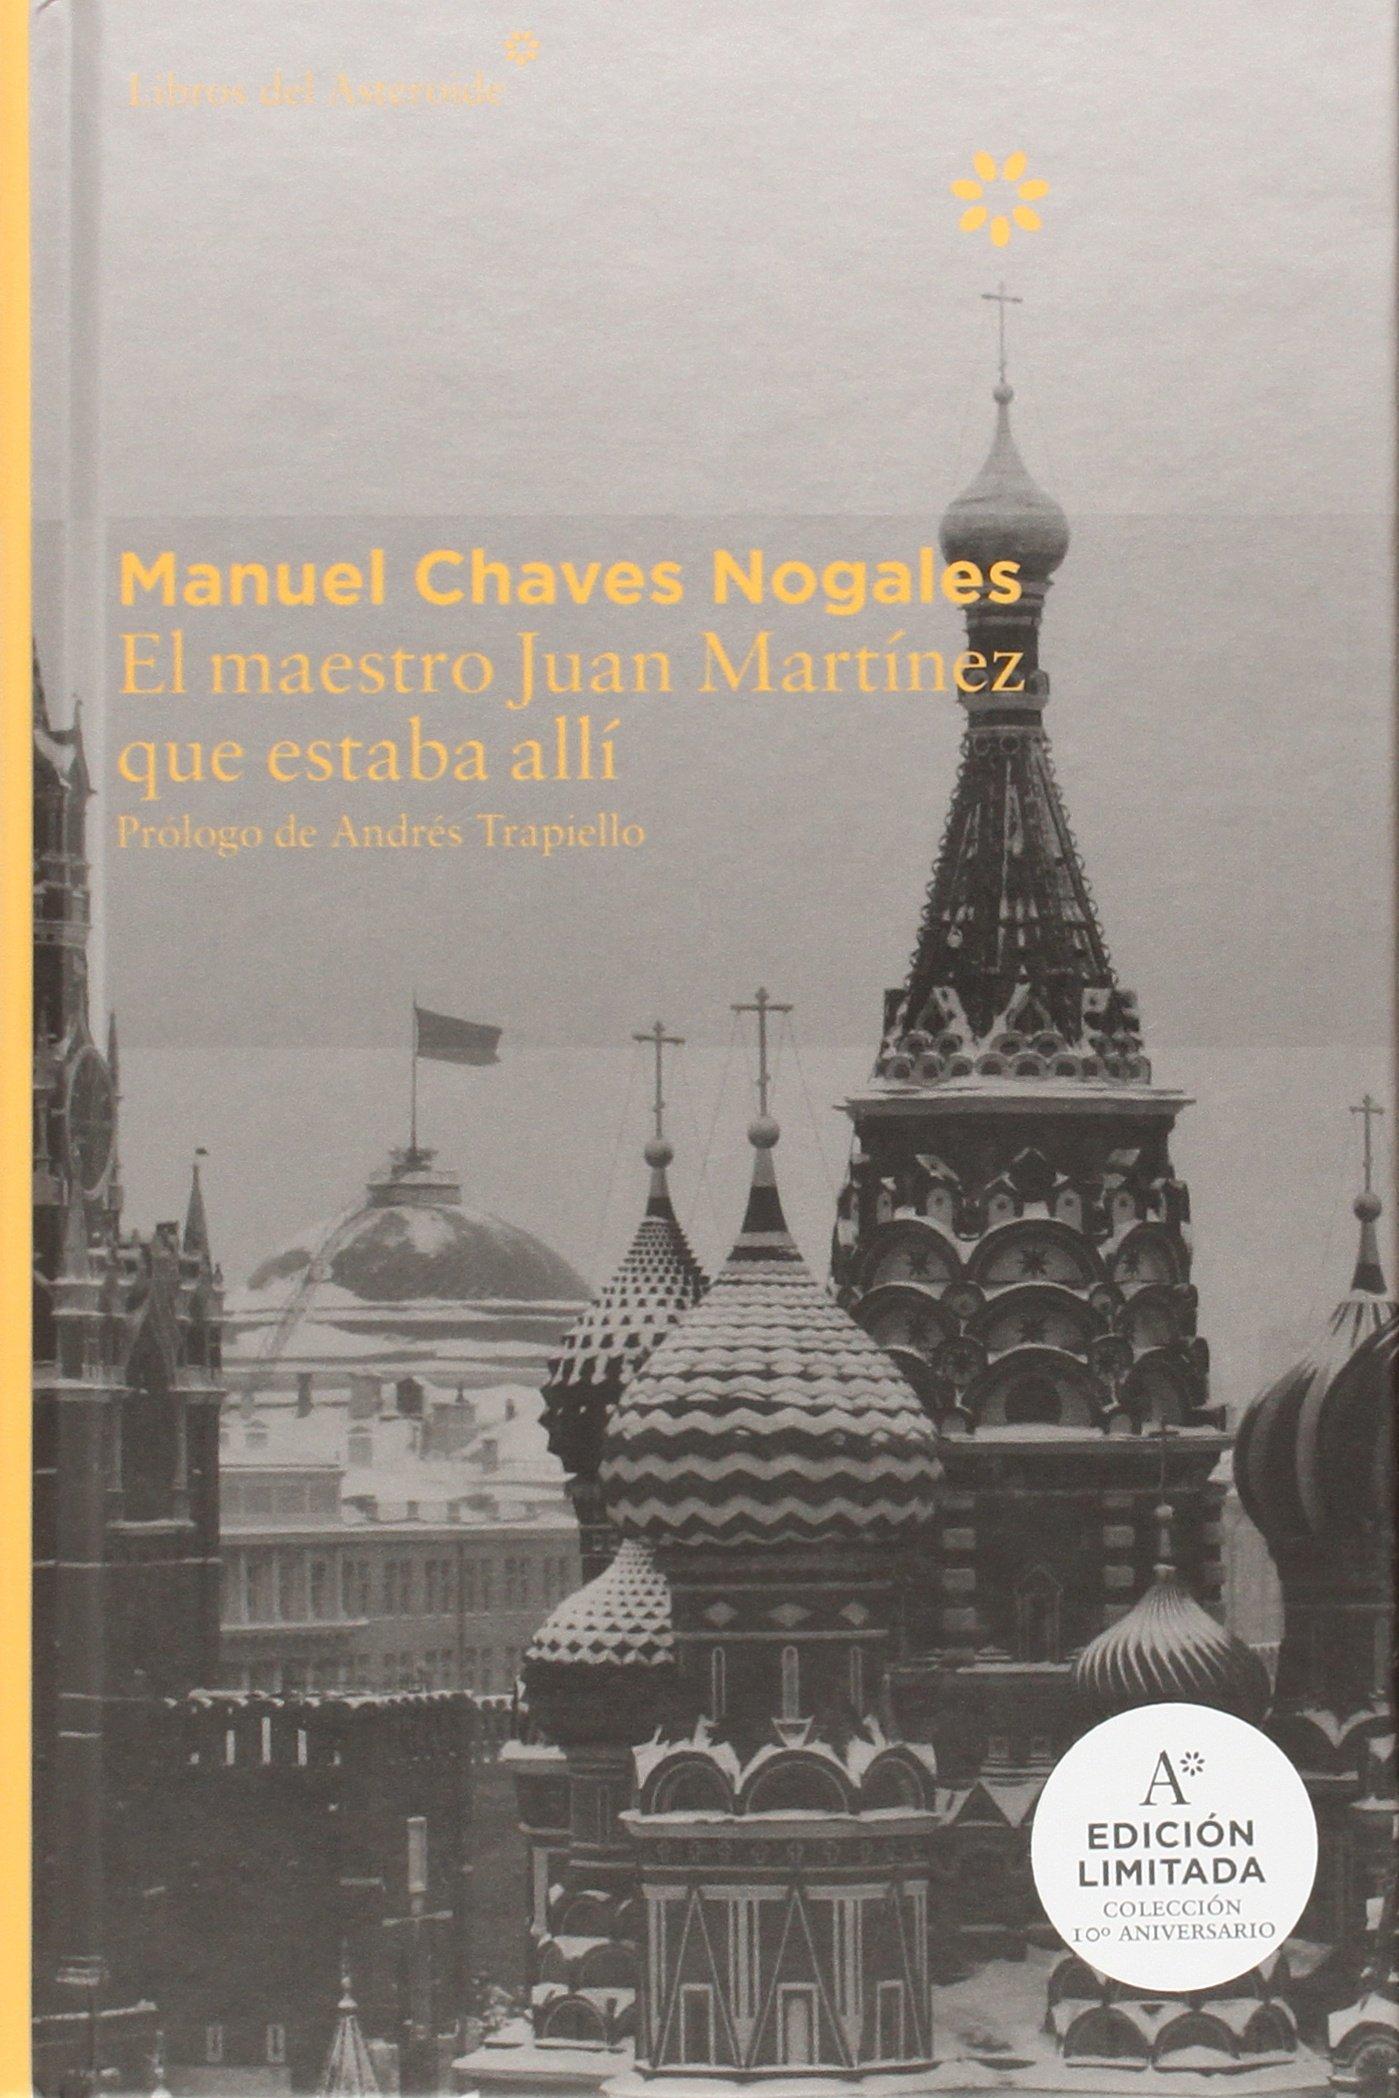 Manuel Chaves Nogales - Alchetron, The Free Social Encyclopedia